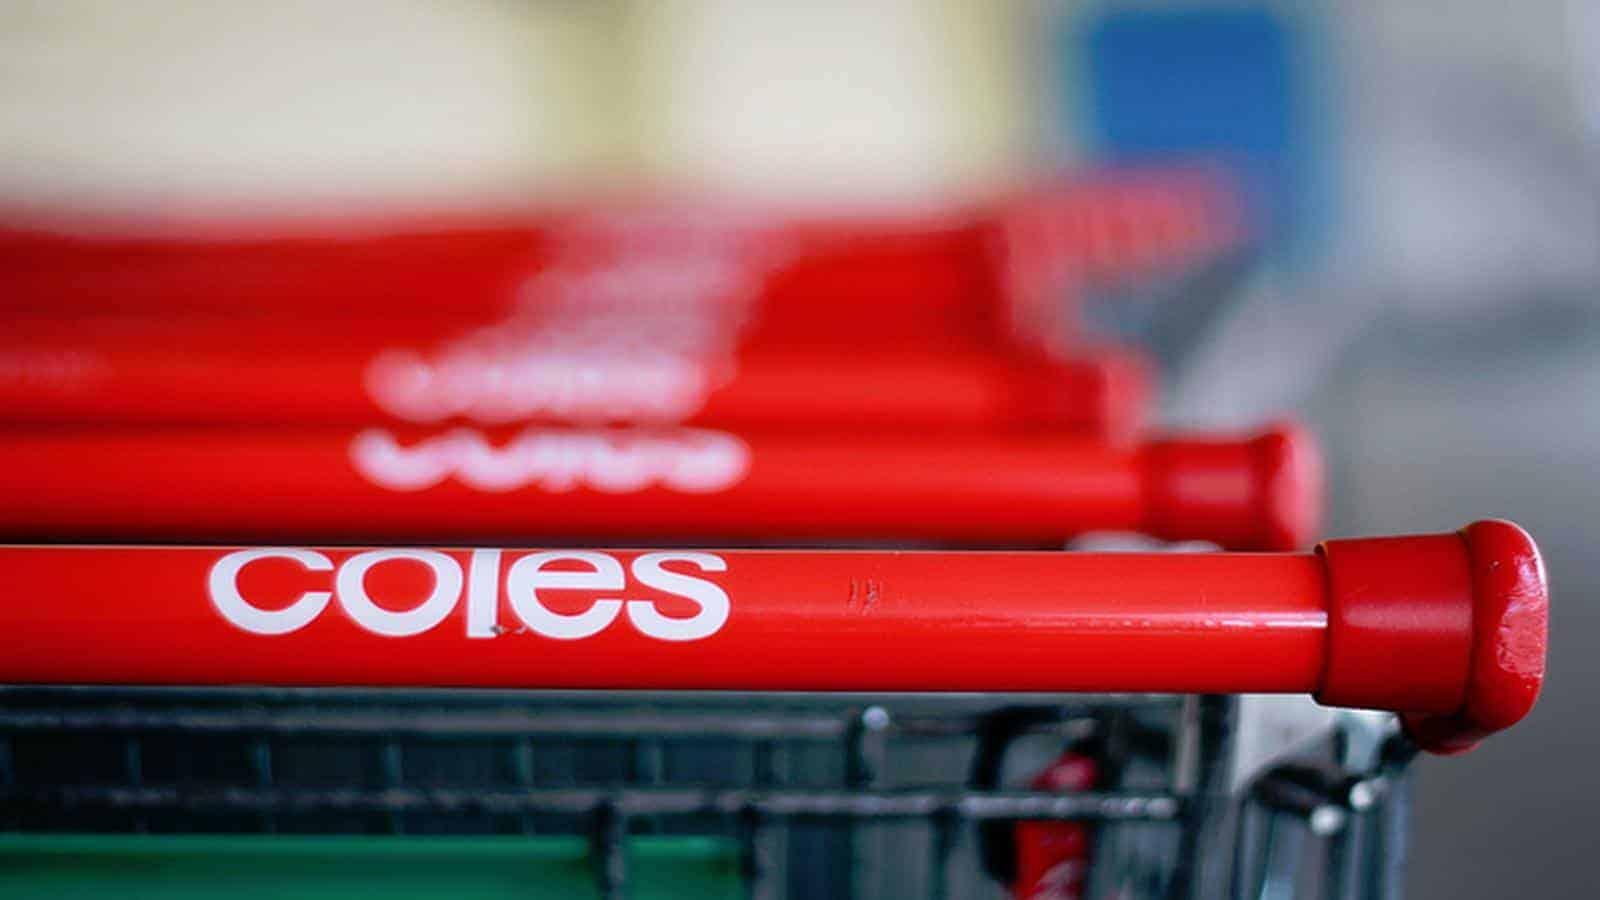 Coles Group (ASX:COL)